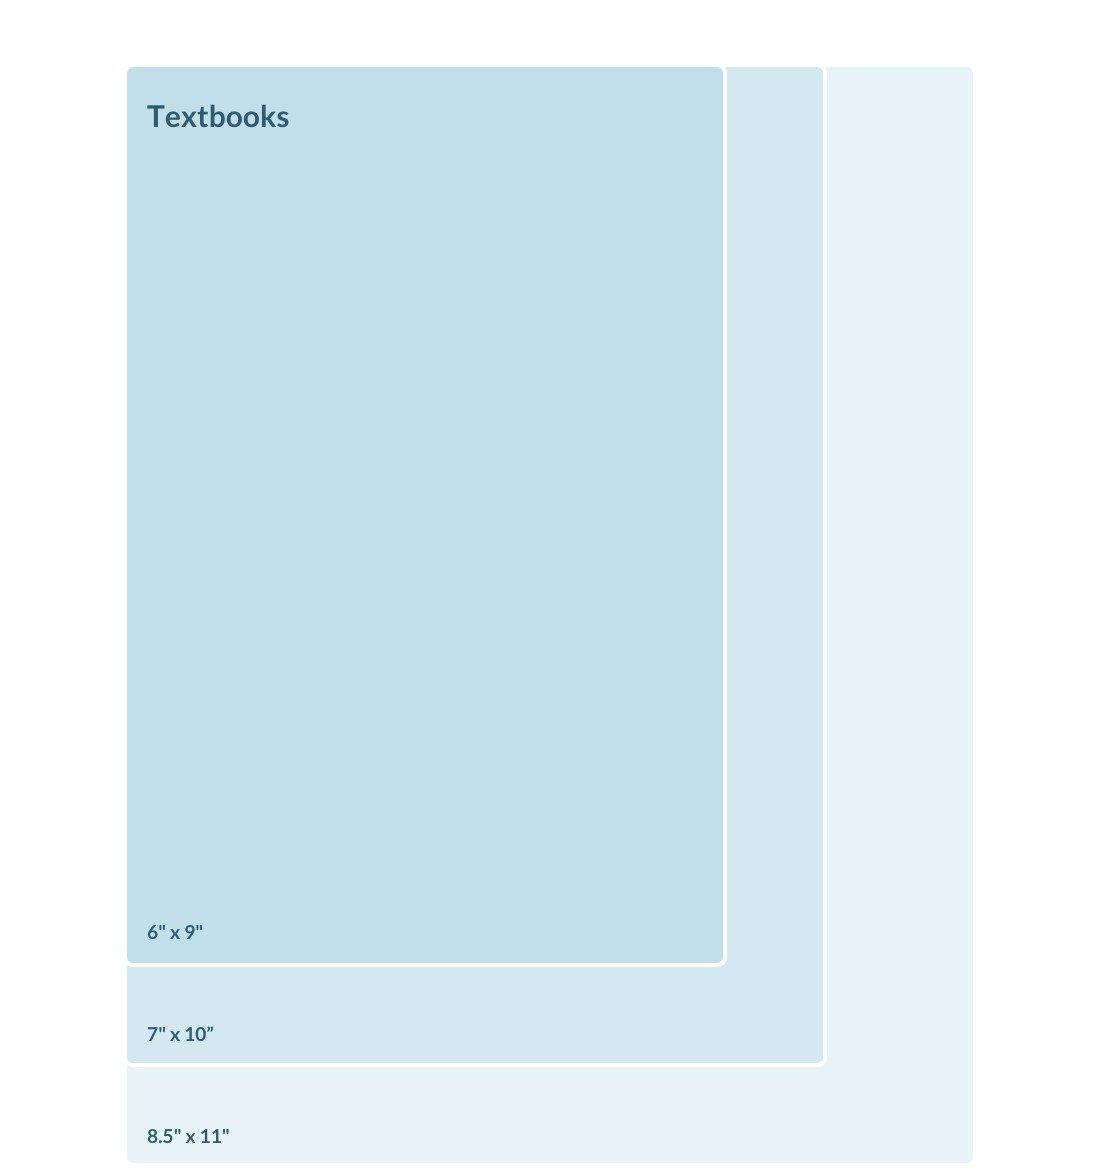 Standard Book Sizes | Textbook Sizes